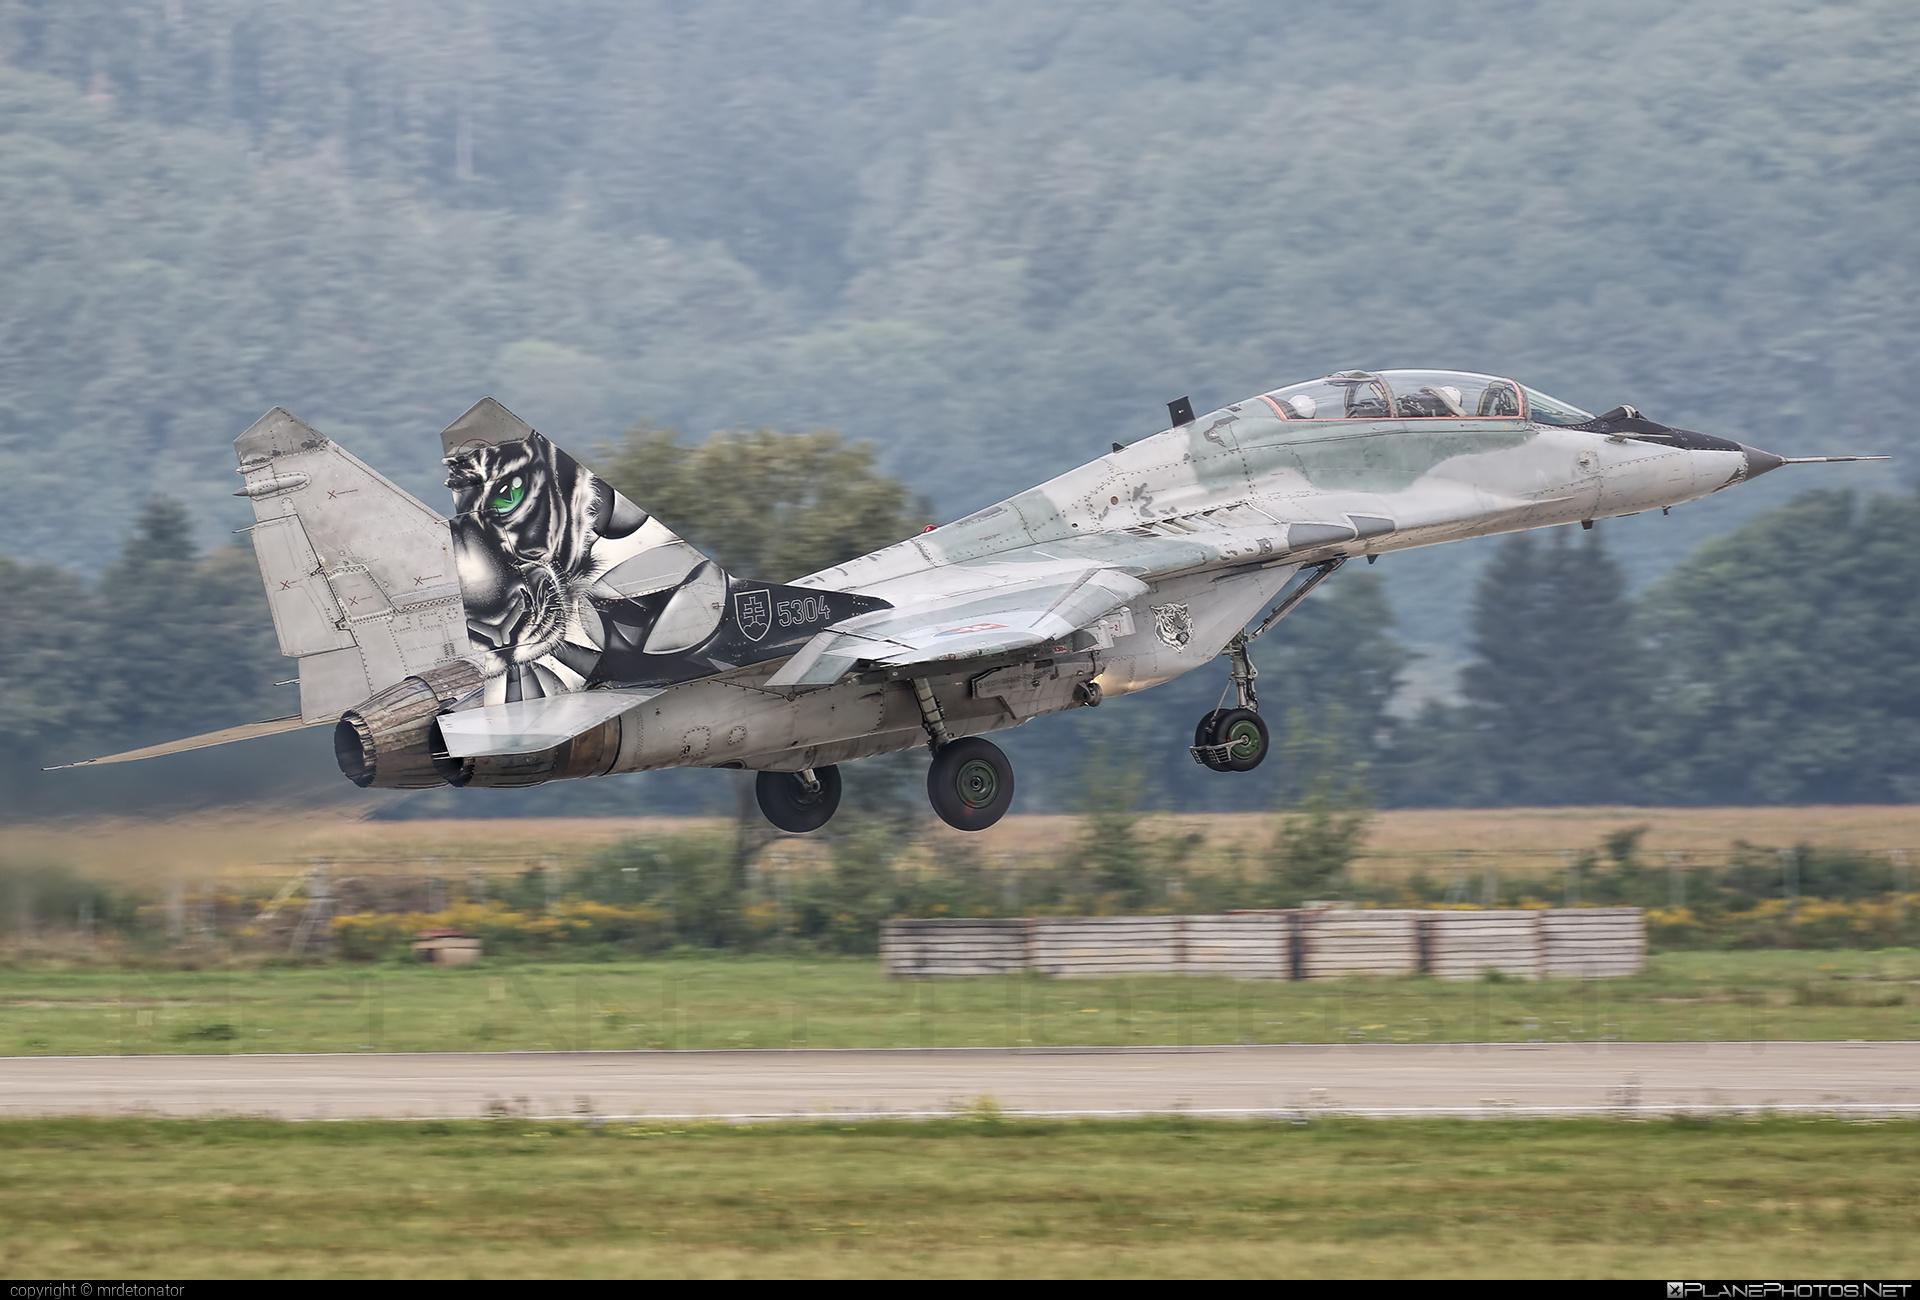 Vzdušné sily OS SR (Slovak Air Force) Mikoyan-Gurevich MiG-29UBS - 5304 #mig #mig29 #mig29ubs #mikoyangurevich #slovakairforce #vzdusnesilyossr